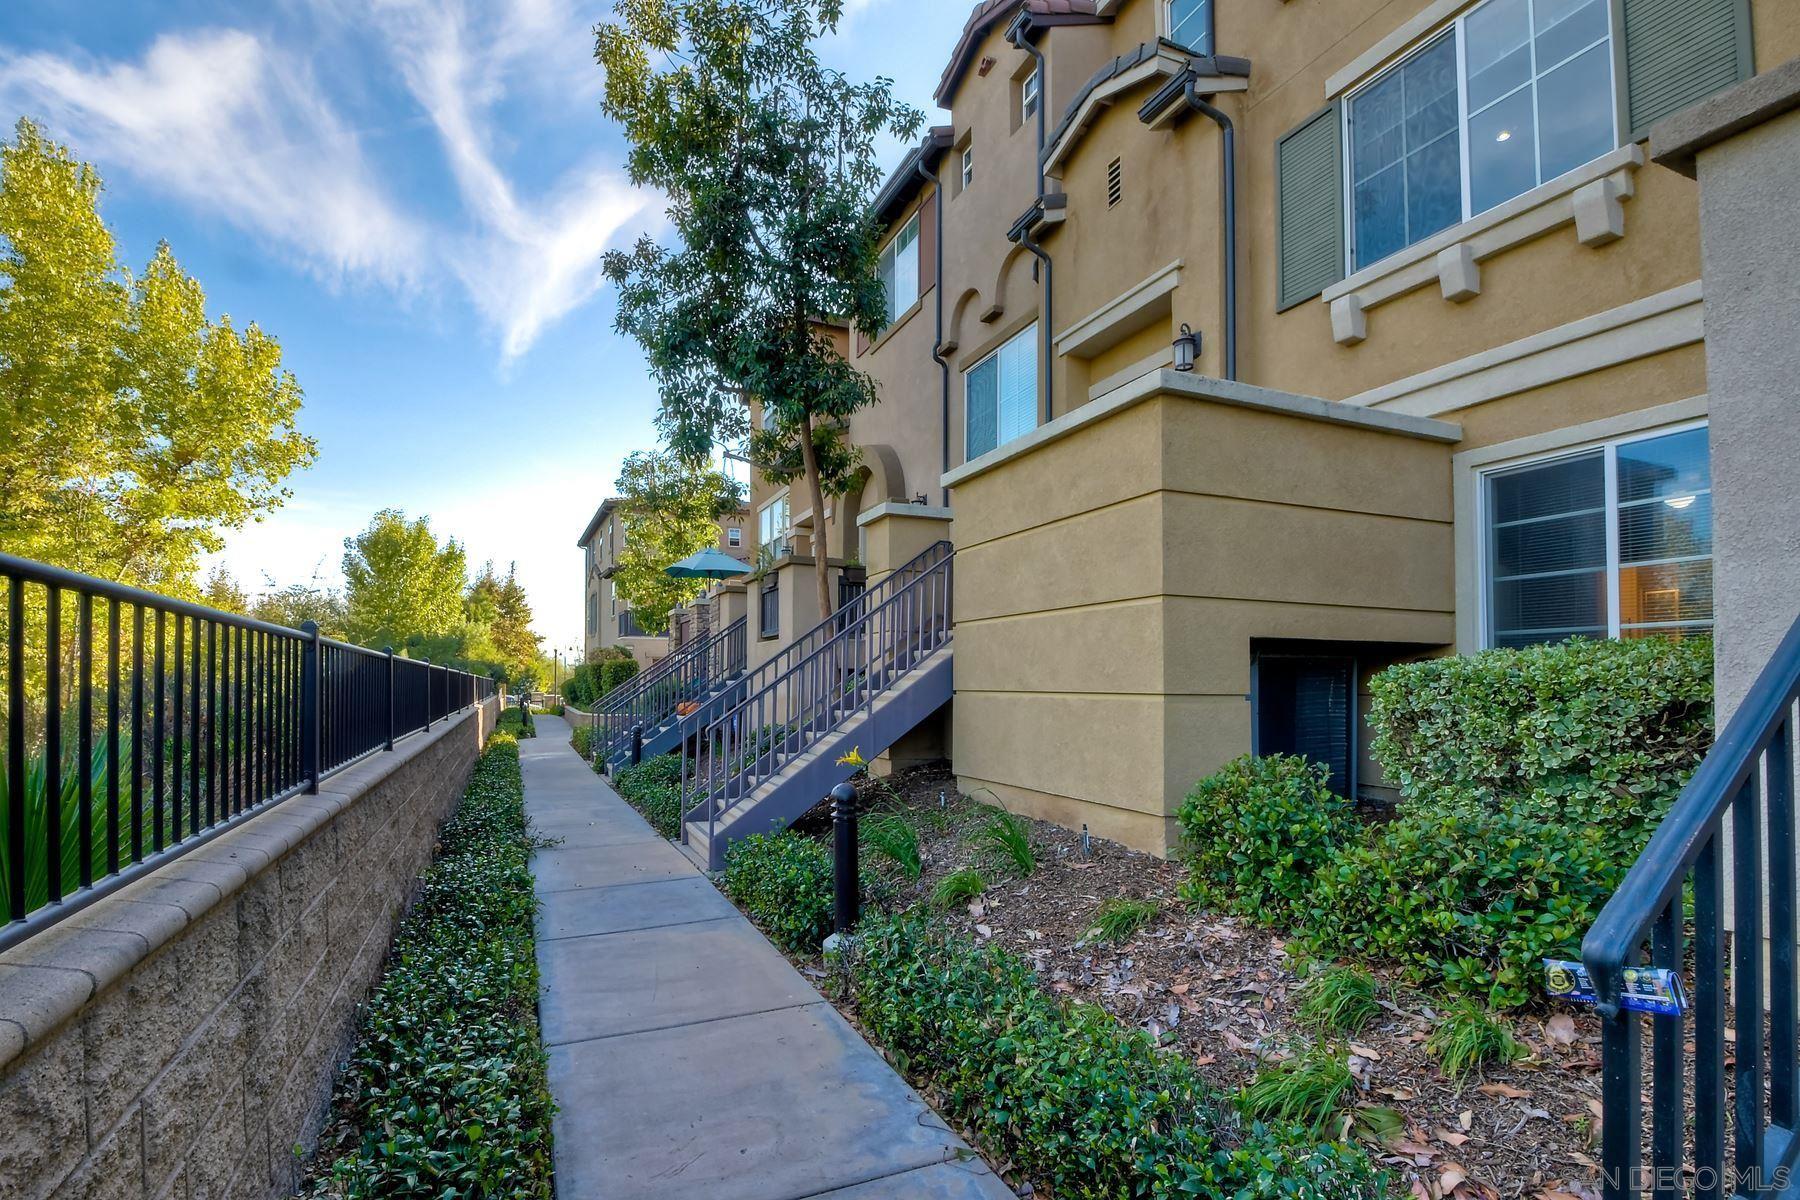 Photo of 10117 STAR MAGNOLIA LN, Santee, CA 92071 (MLS # 200050960)